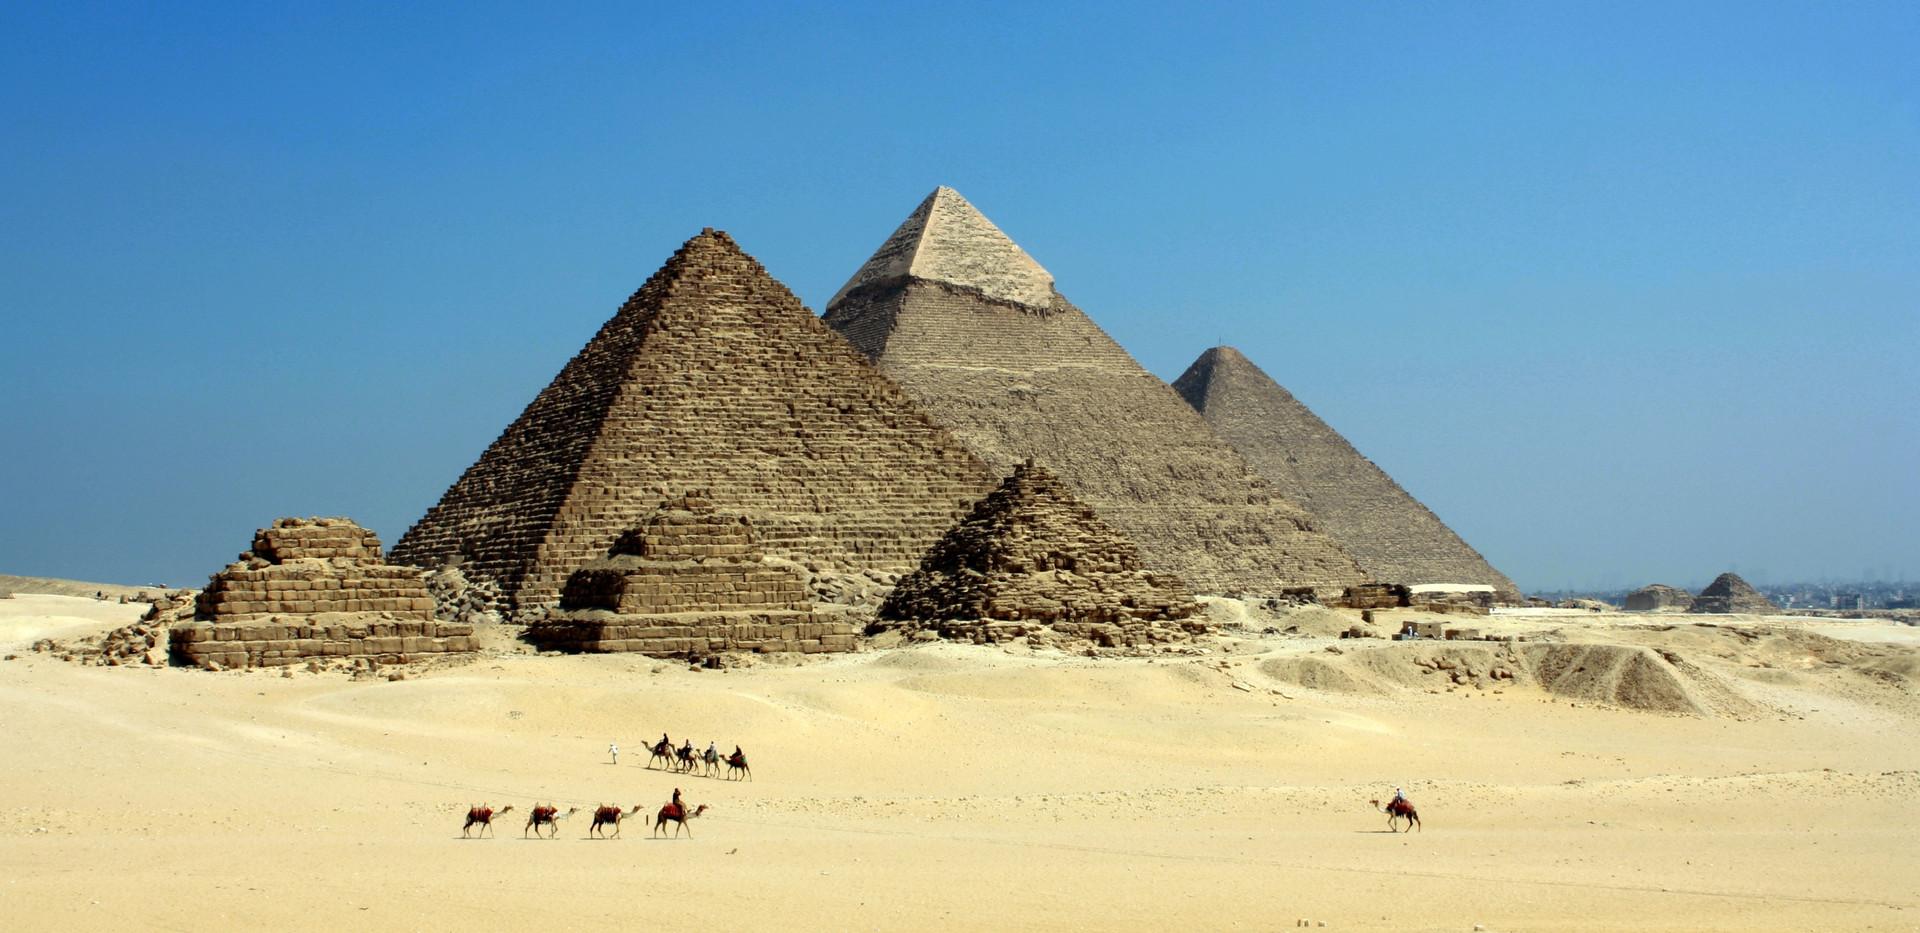 blue-sky-camels-desert-71241 copy.jpg